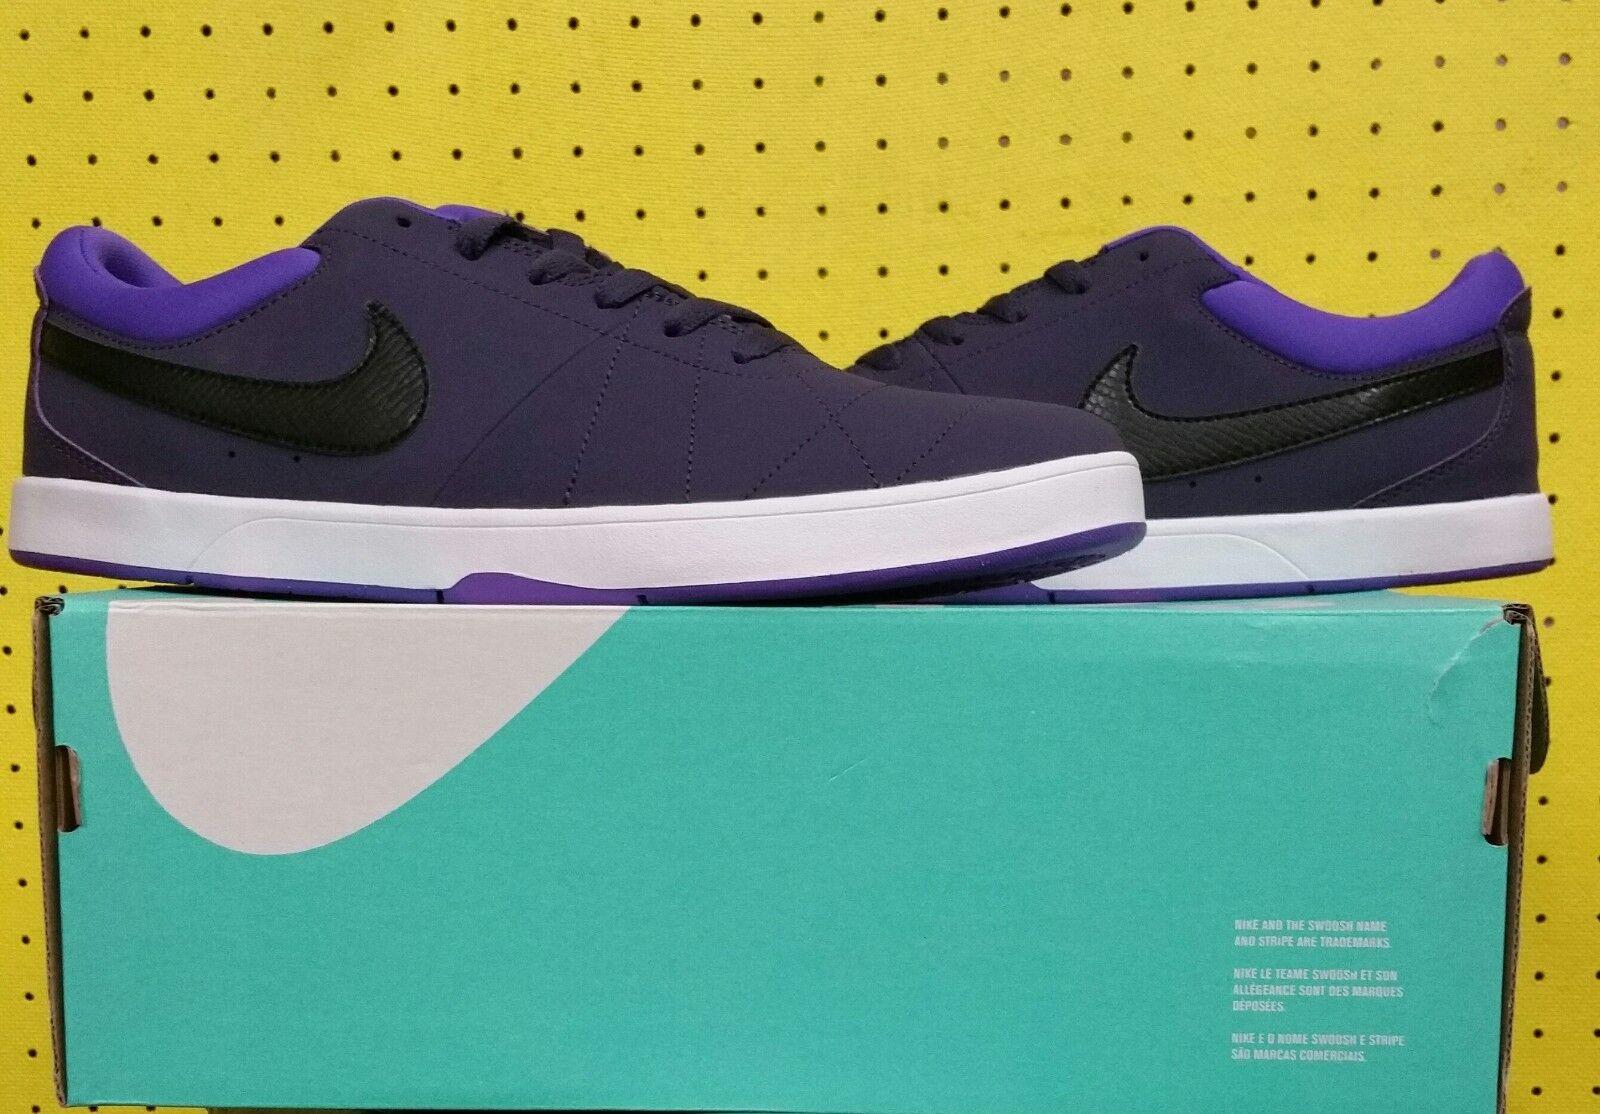 BRAND NEW Men's Nike SB Rabona Shoes Sz 11.5 Dark Raisin Hyper Grape Purple